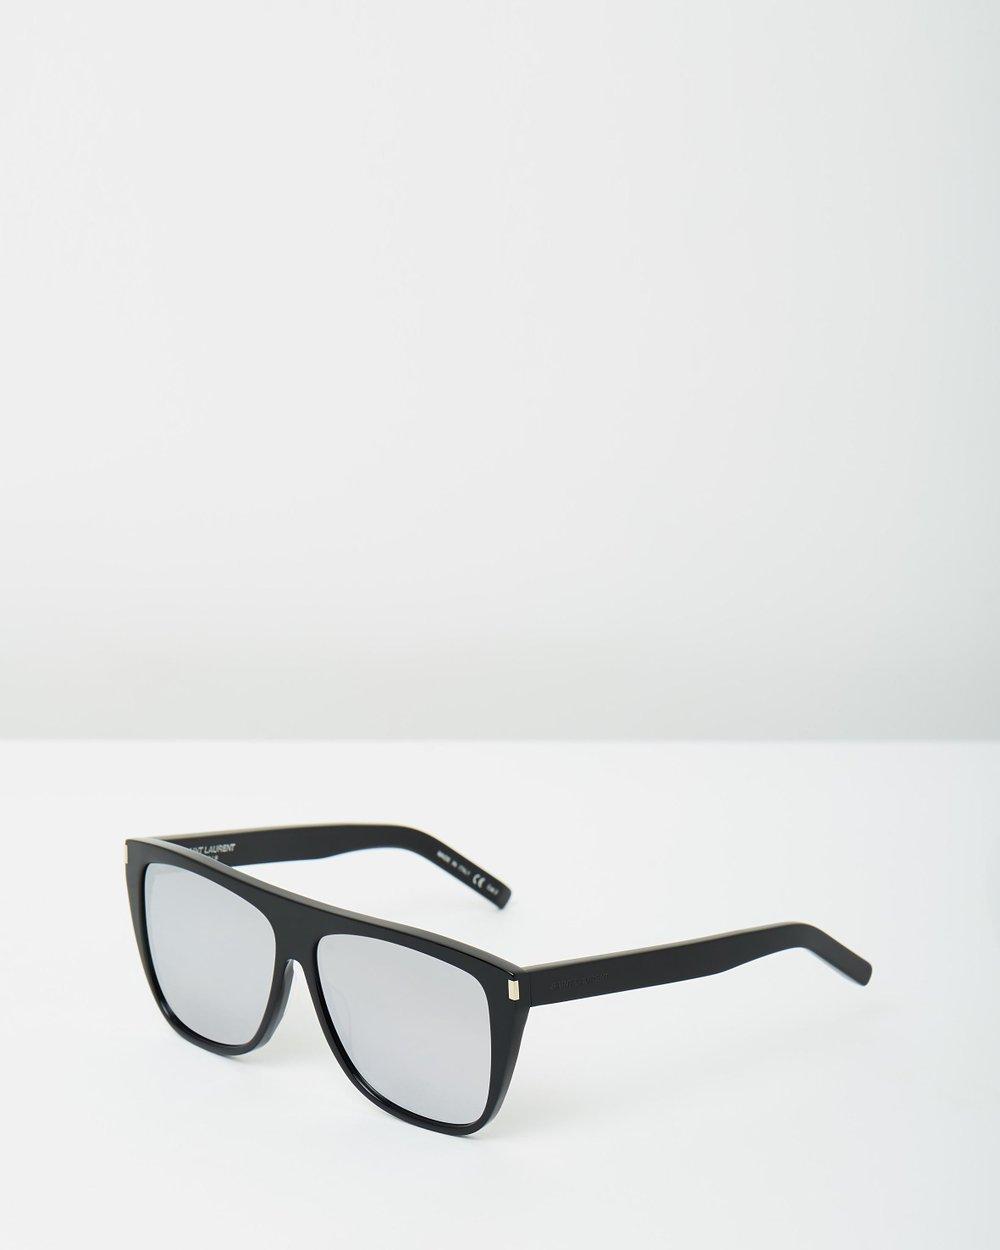 7e897740e7 Mirrored Flat Top Sunglasses by Saint Laurent Online